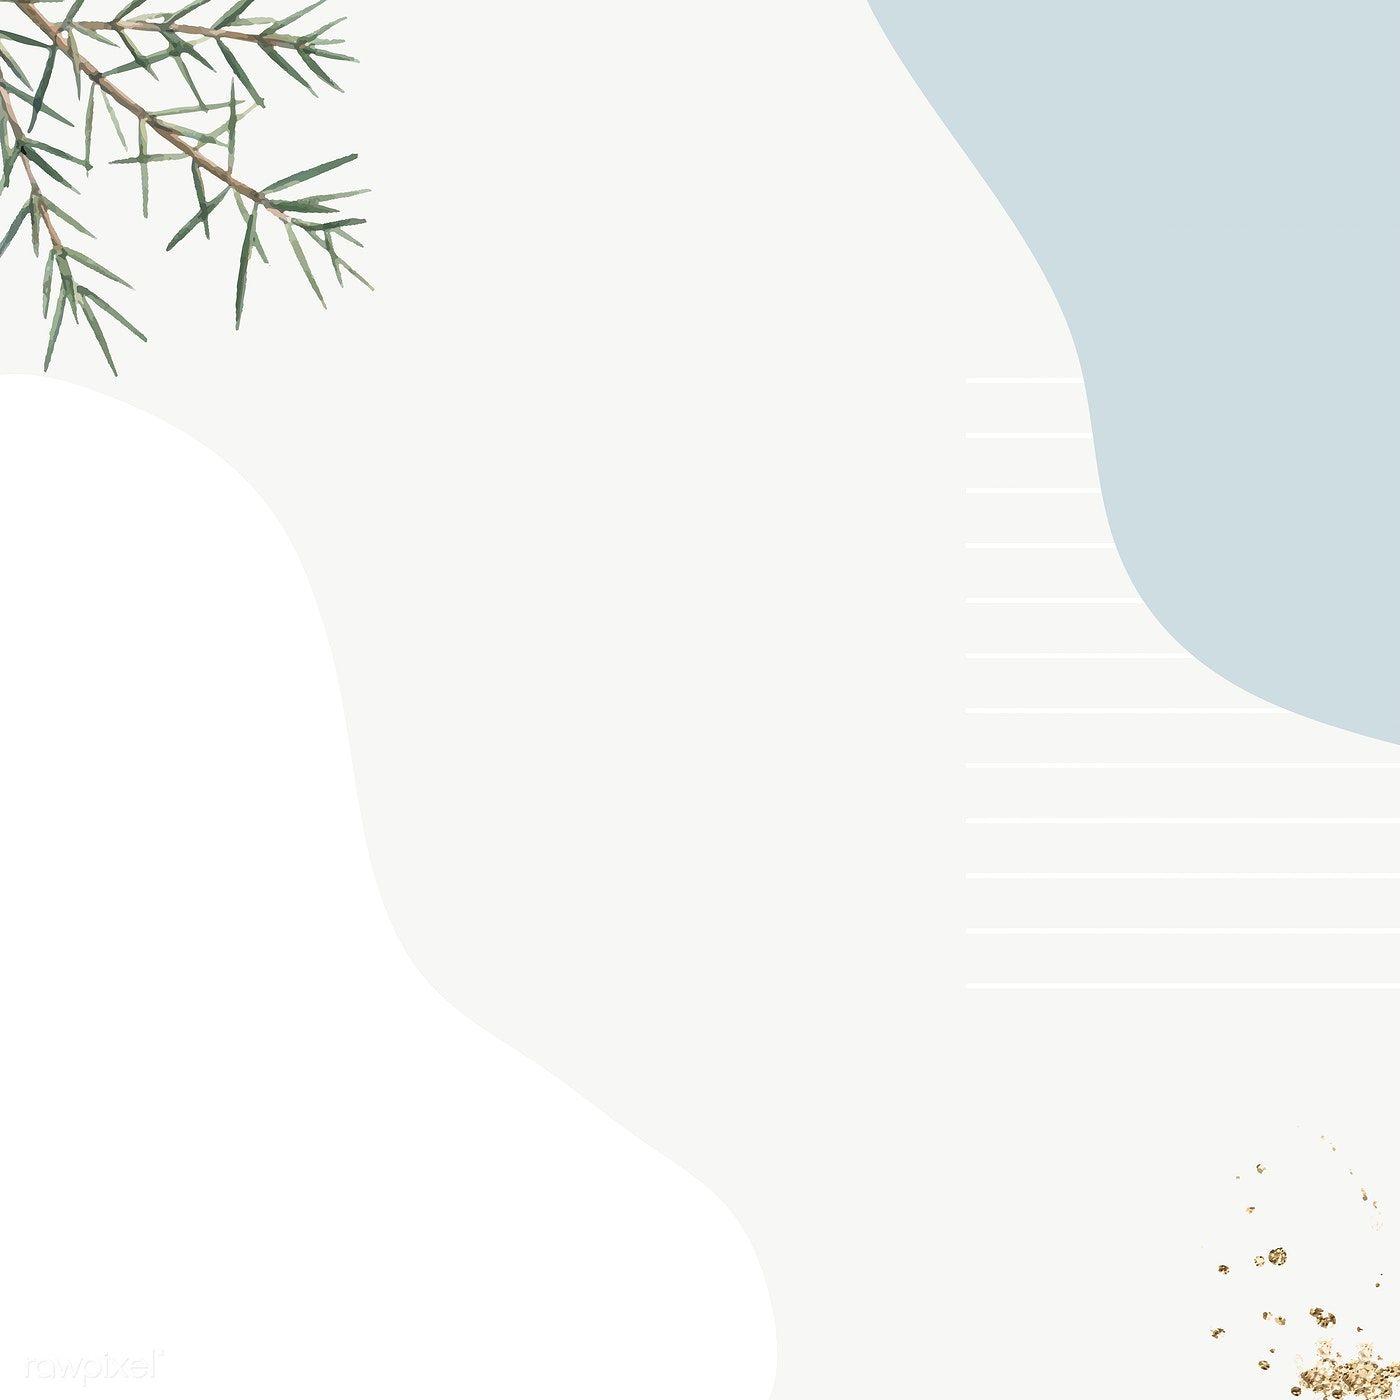 Download Premium Illustration Of Prickly Juniper Branch On Beige